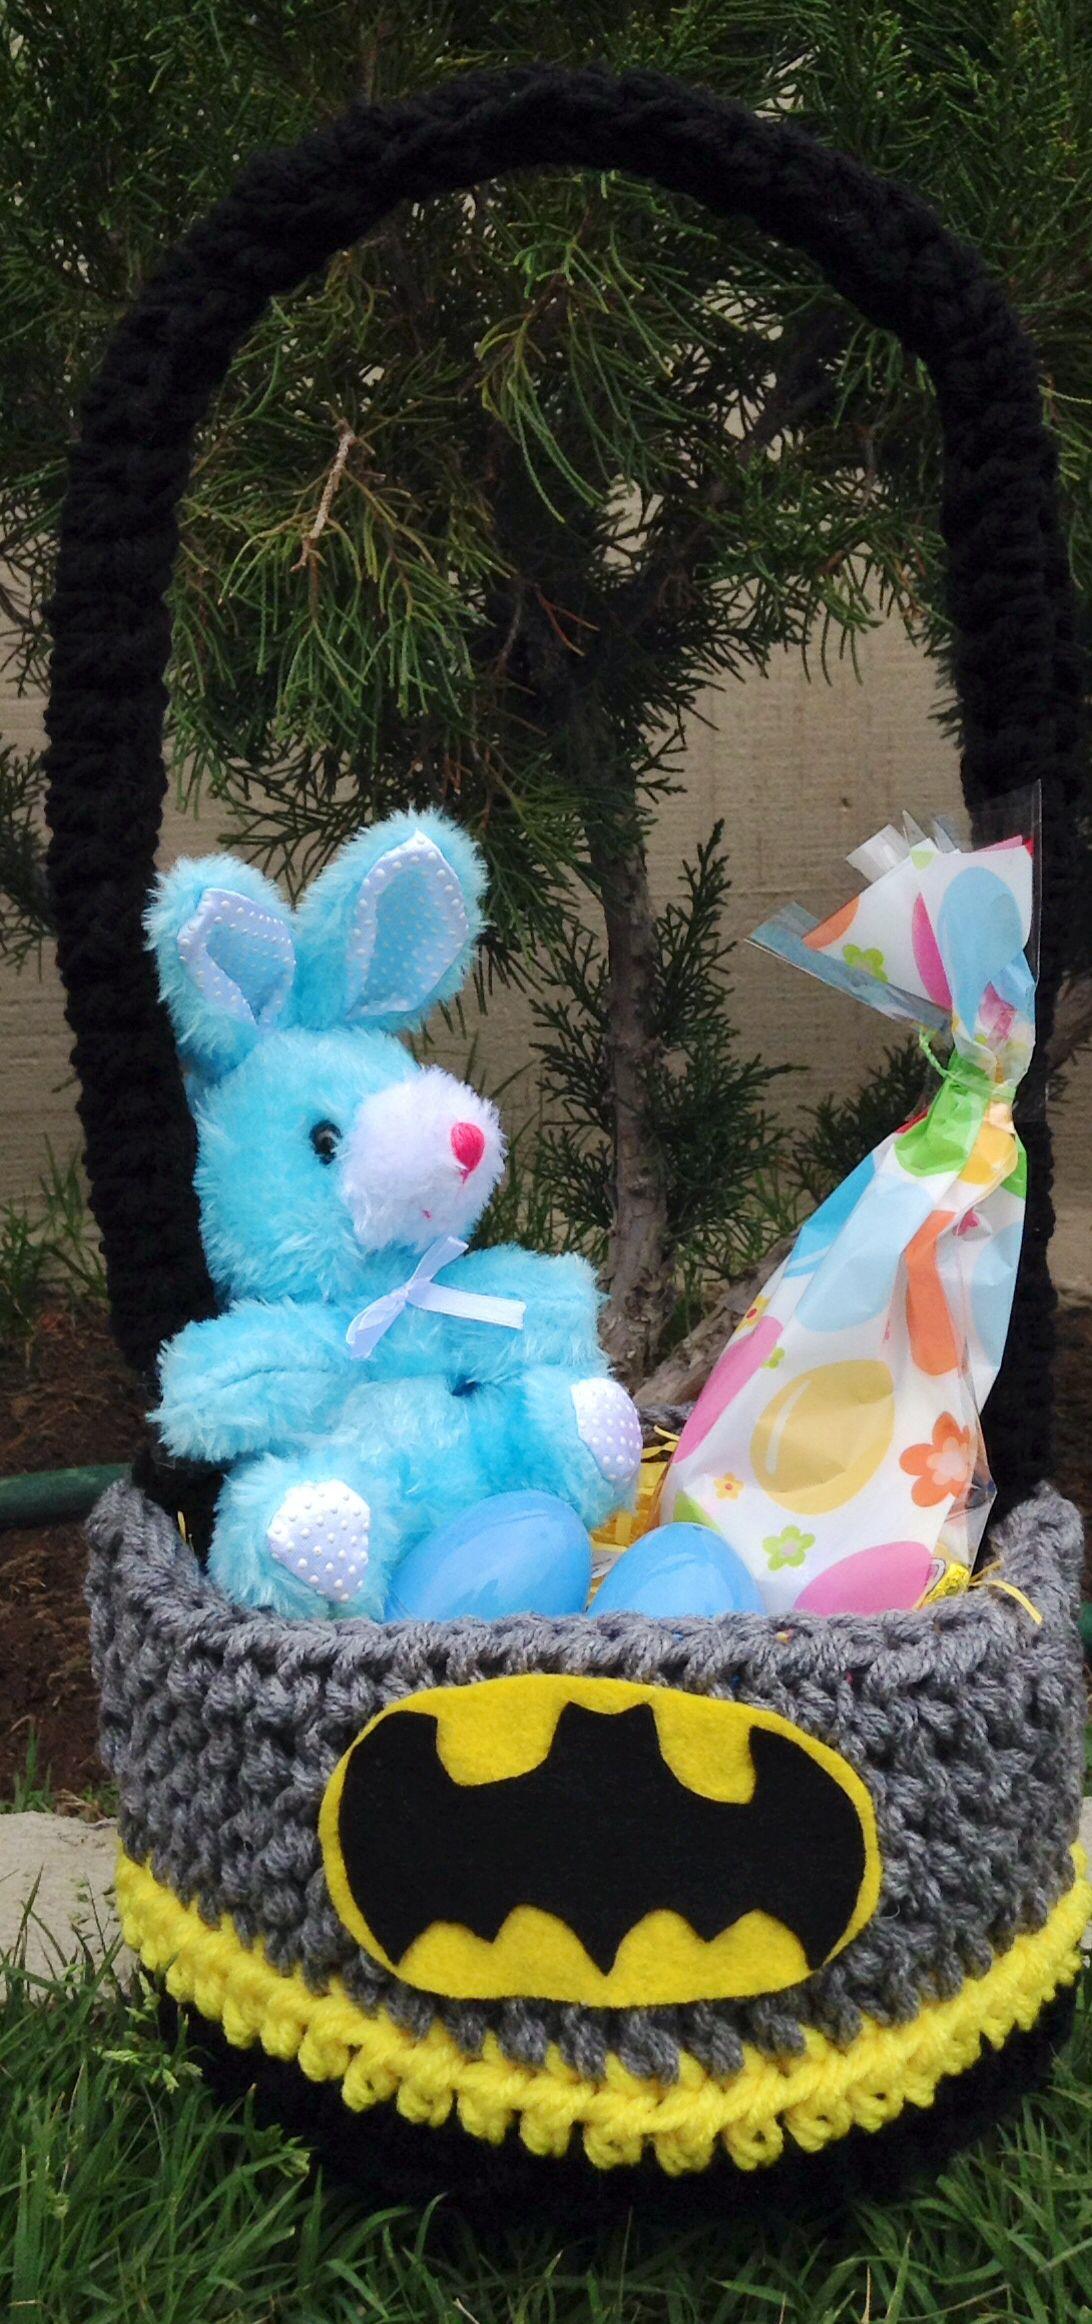 Batman Easter Basket sold on https://www.facebook.com/CrochetingSweetie